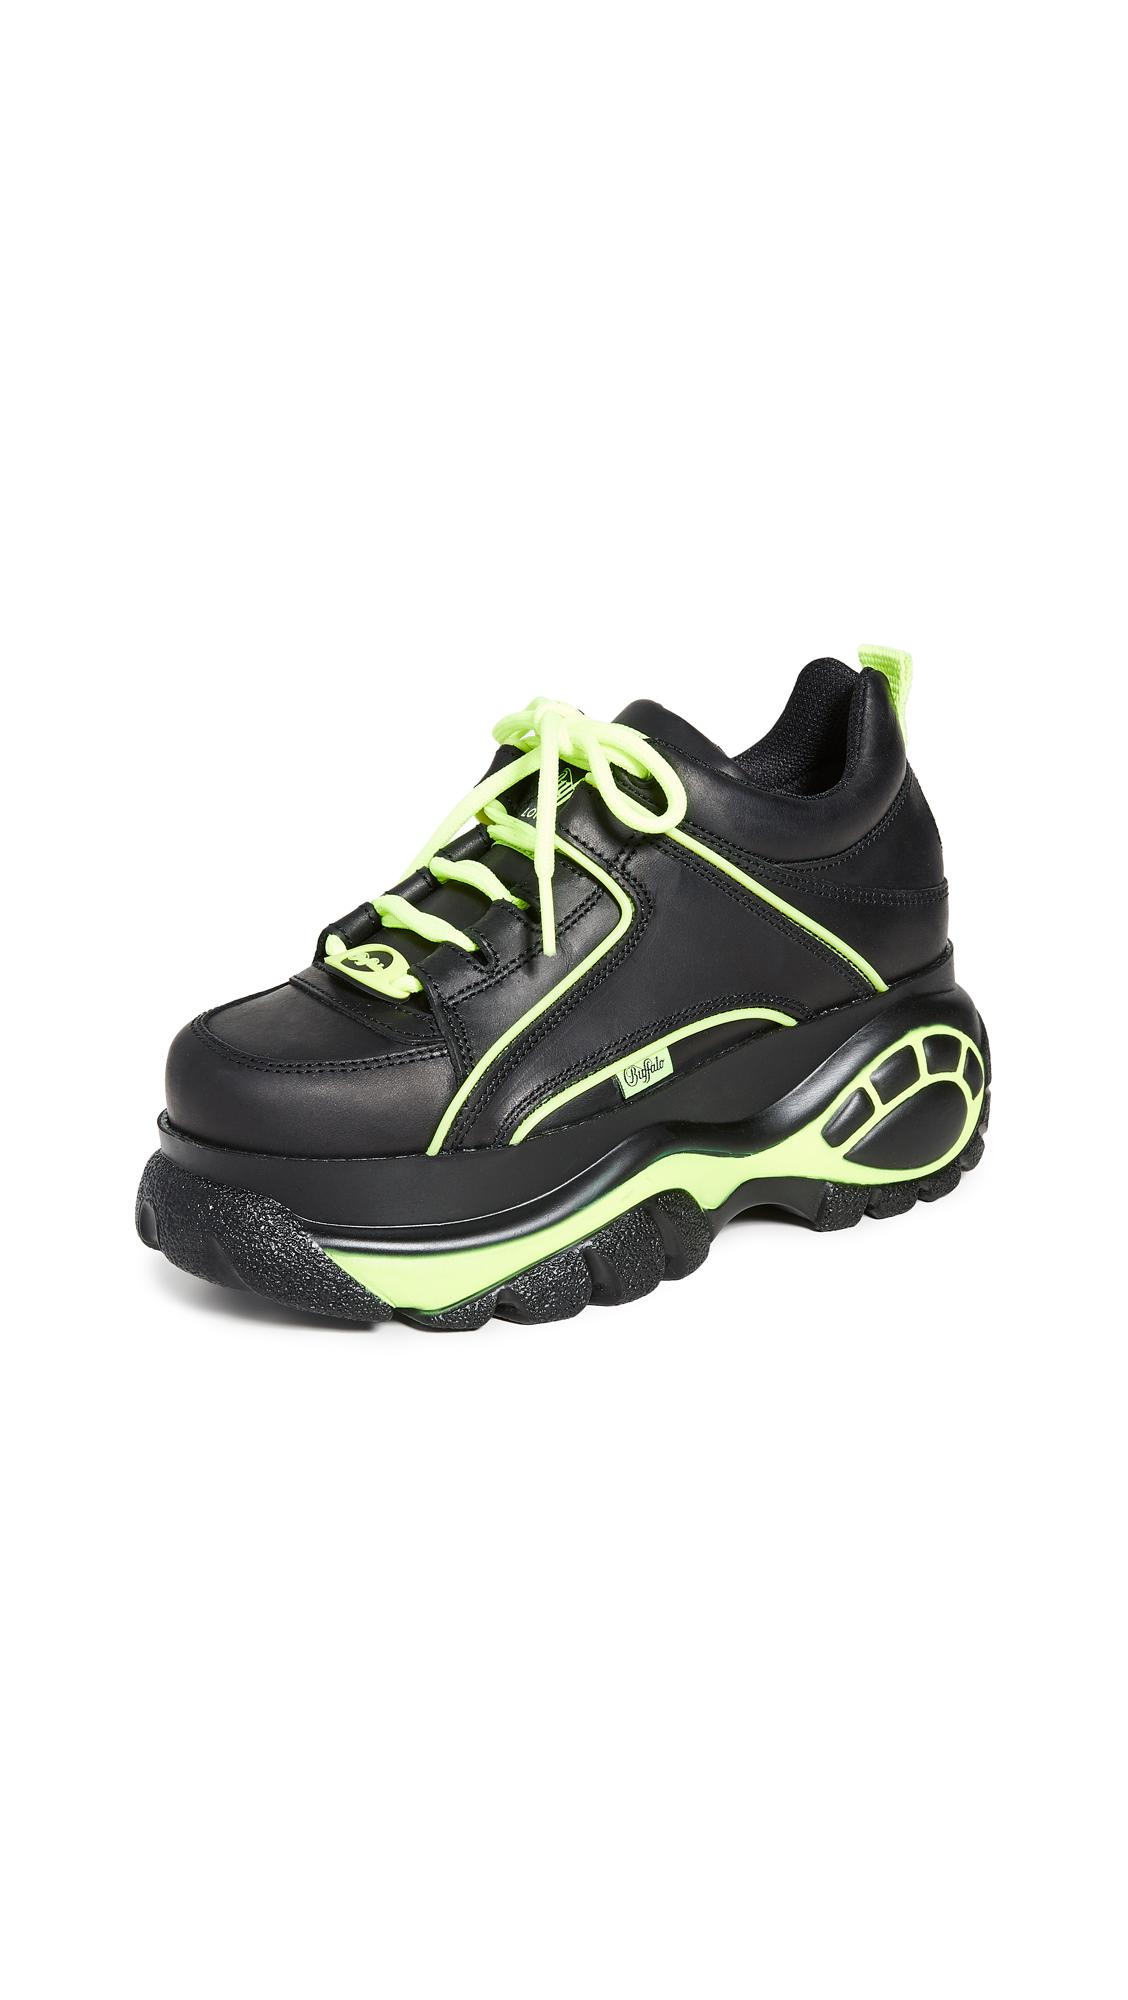 Buffalo London Classic Sneakers - Black/Neon Yellow